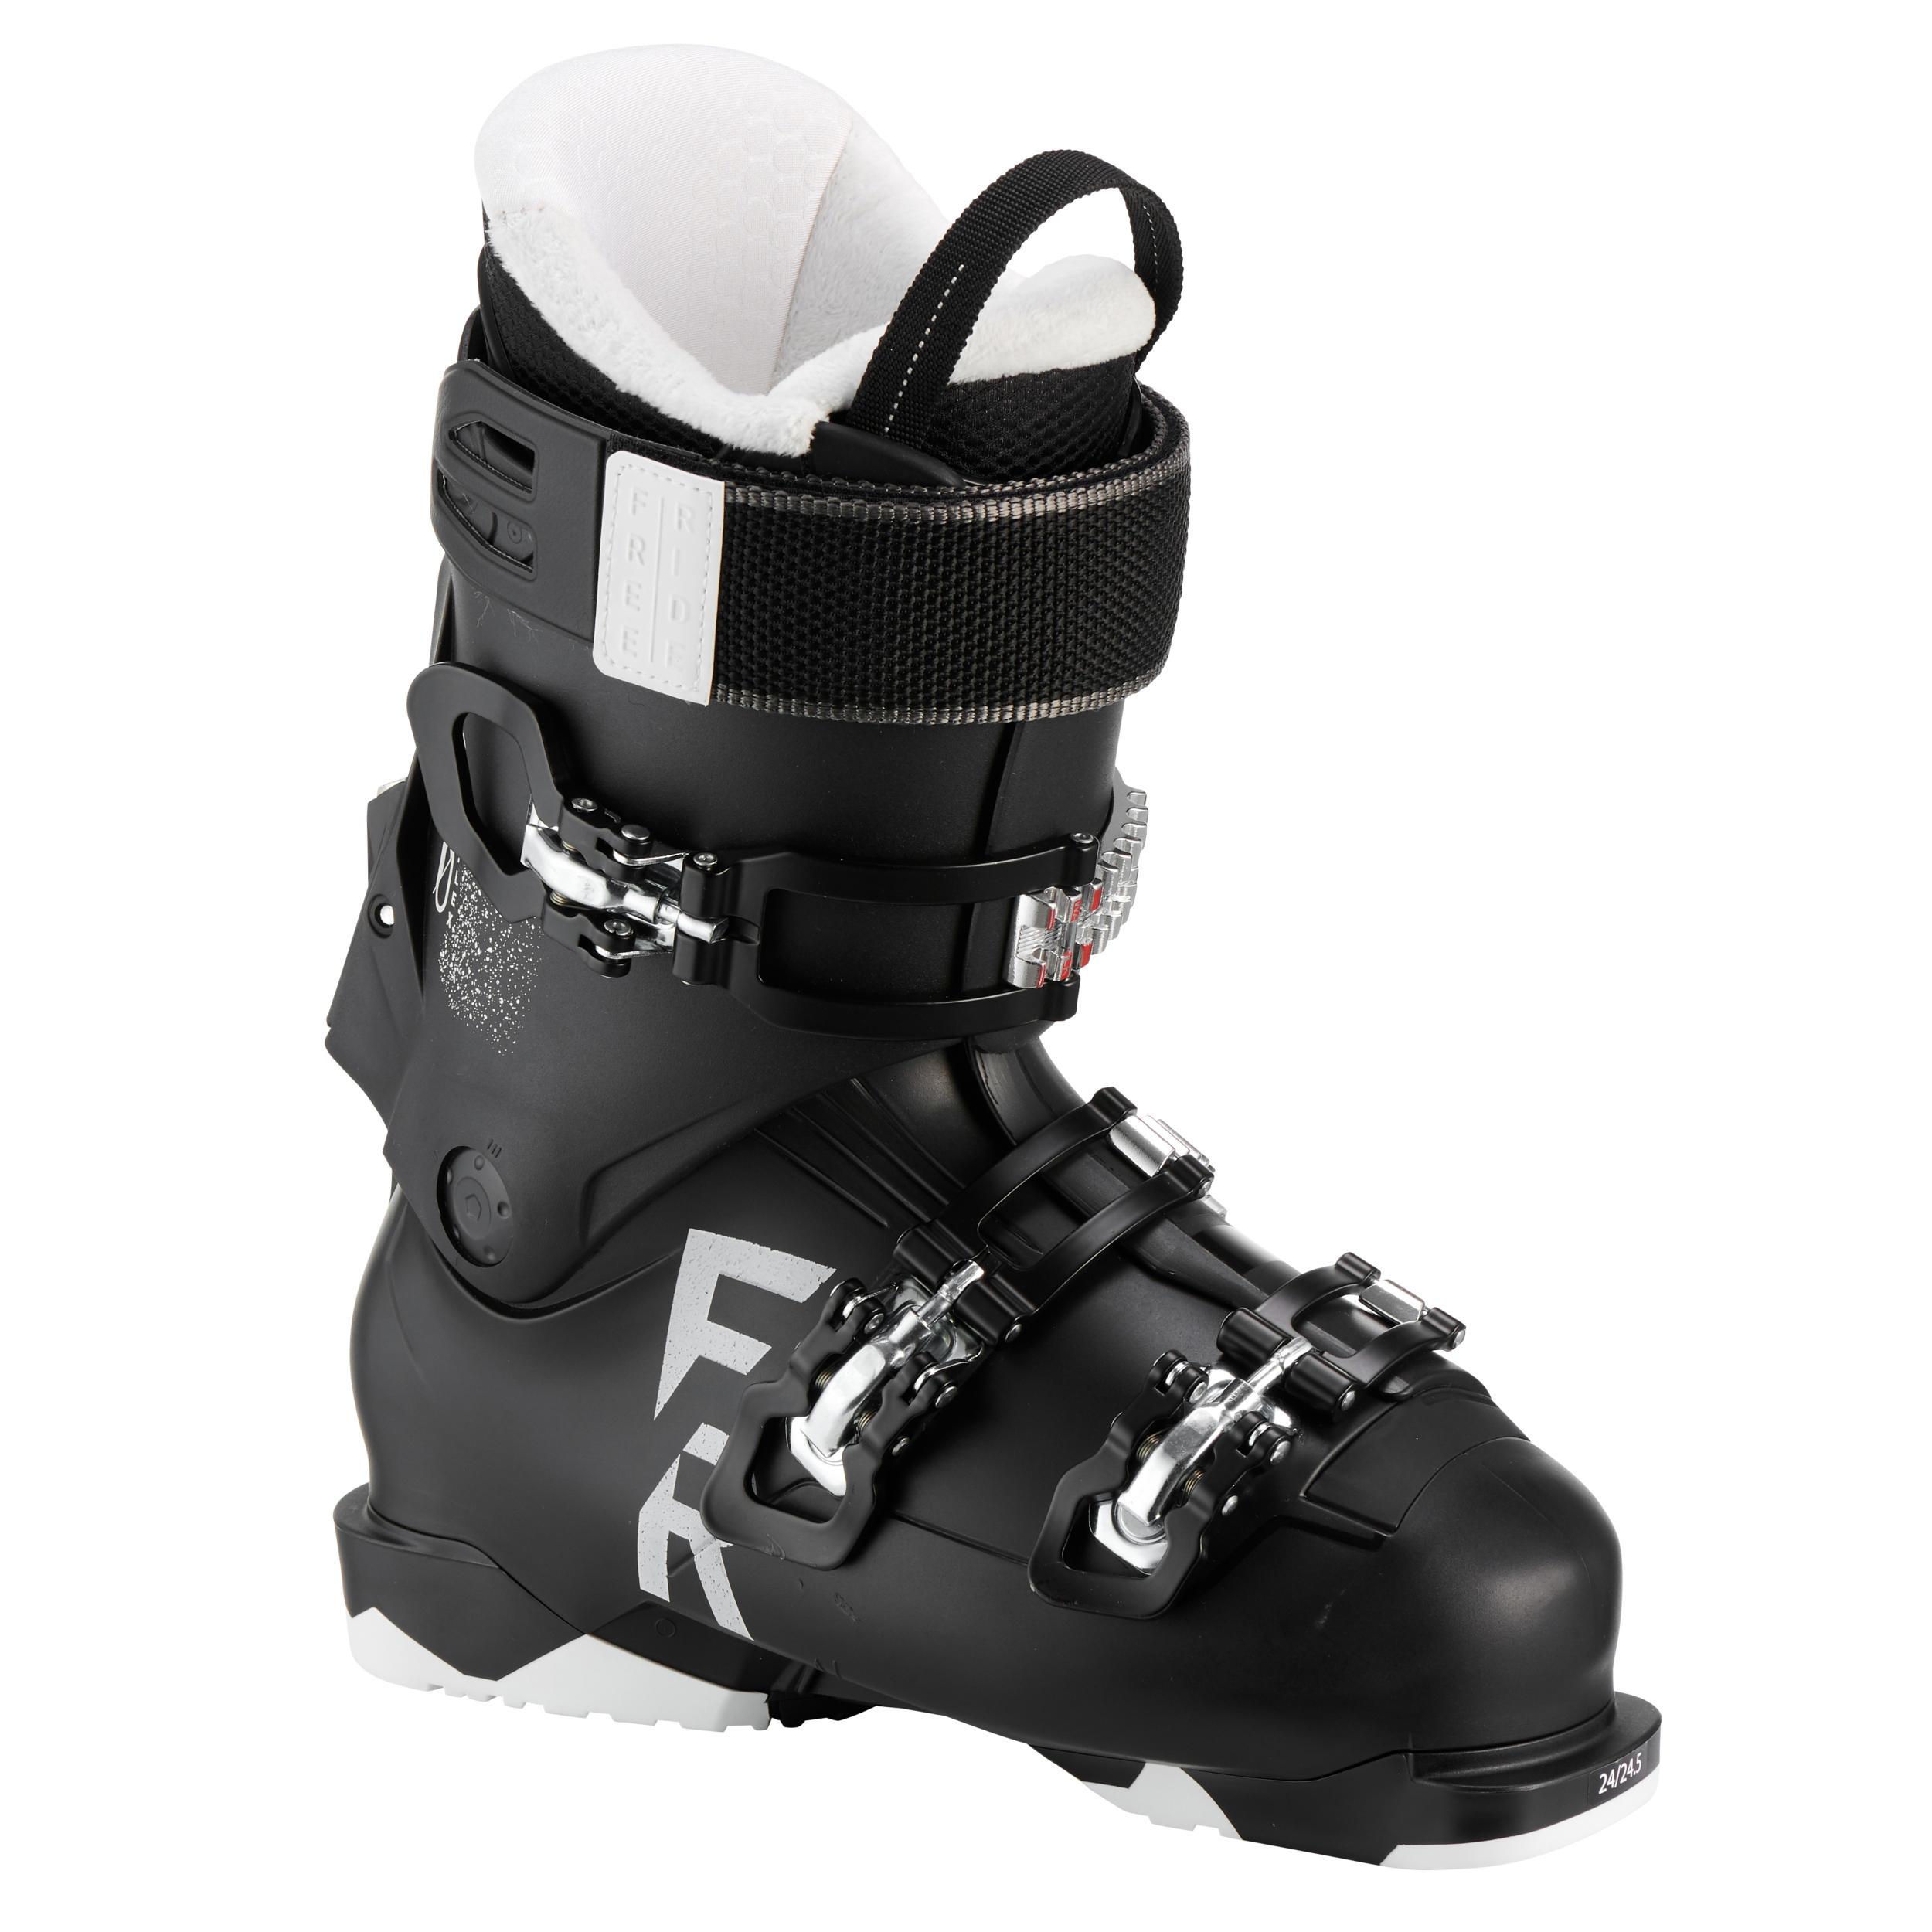 Chaussures de ski Freeride Femmes Wedze FR 100 flex 80 noir - Wedze